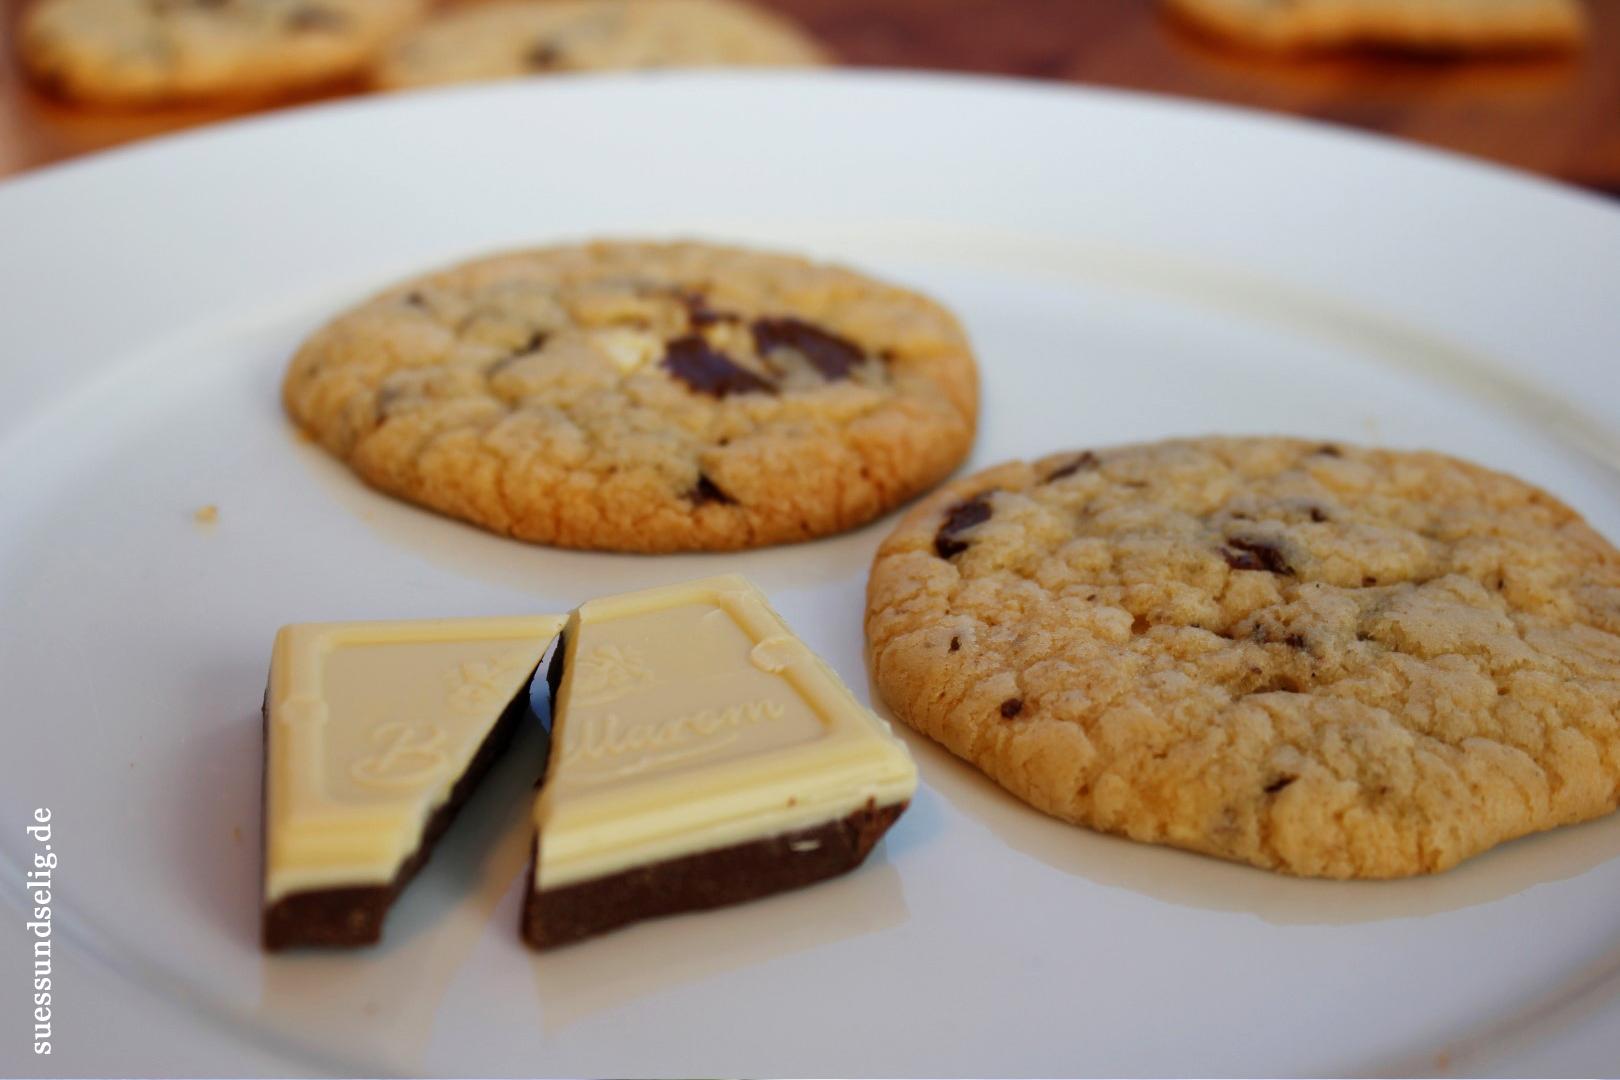 Kaffee-Schokoladen-Cookies